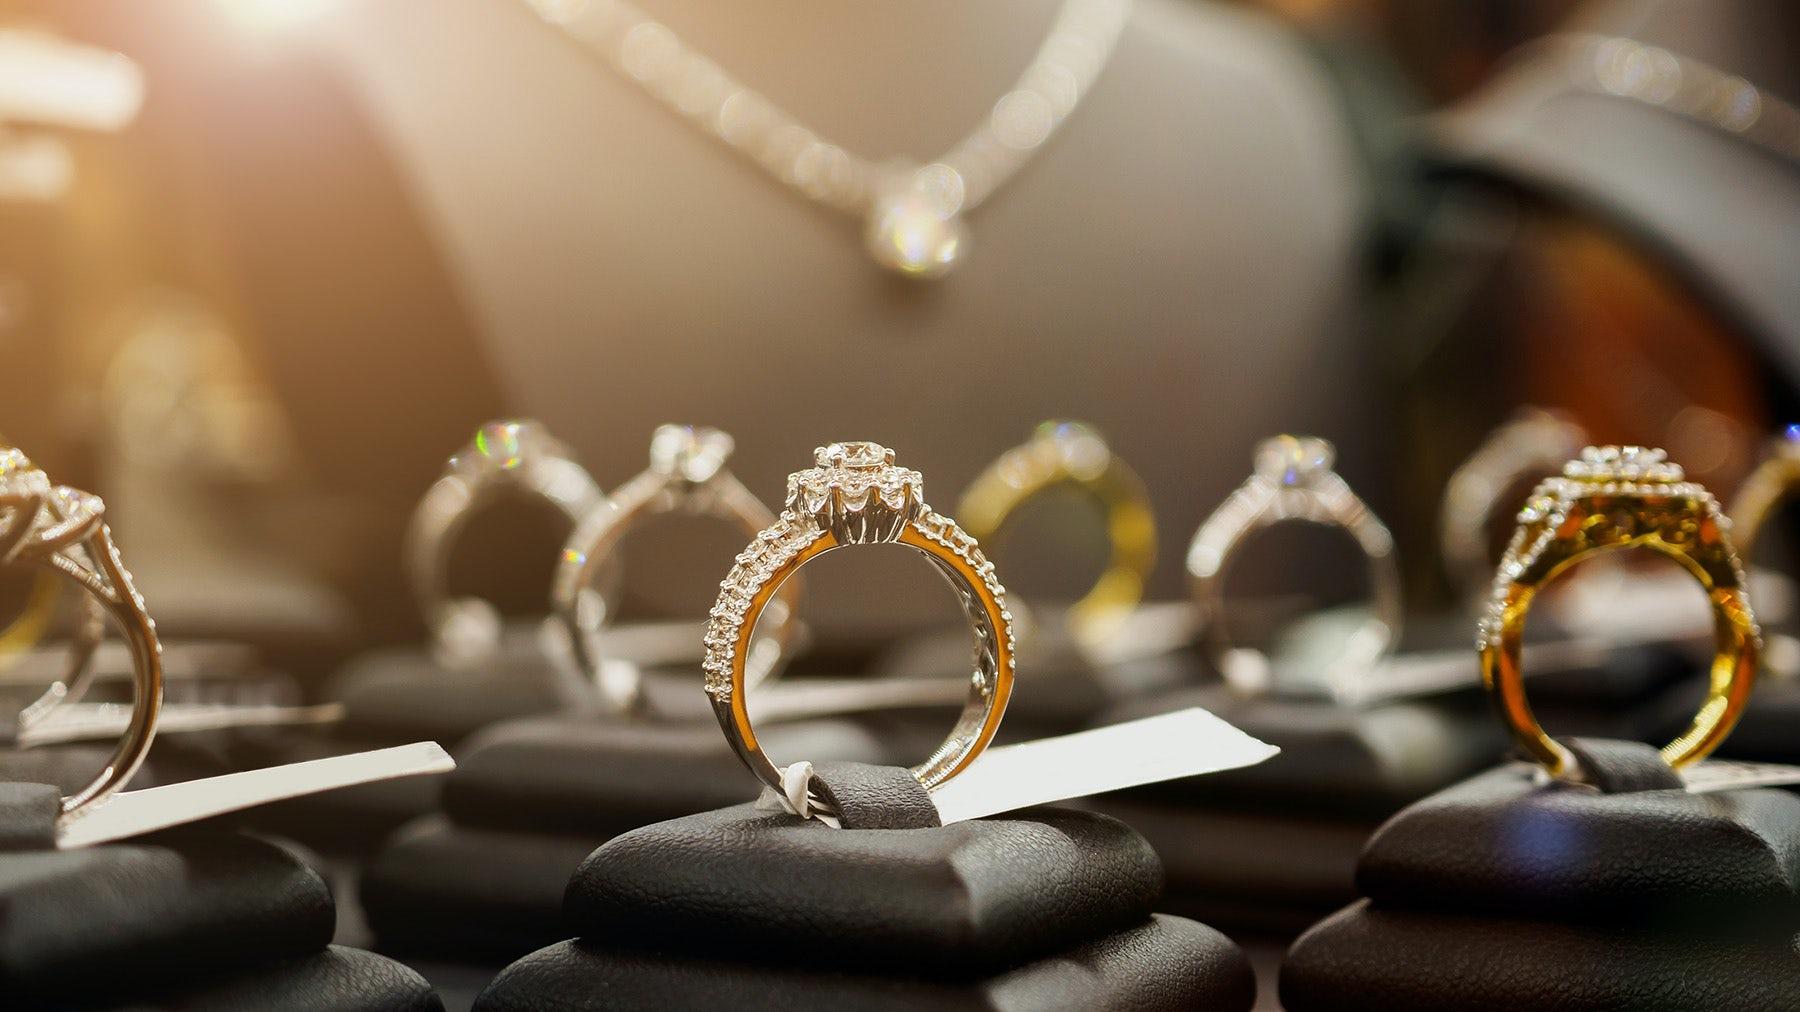 An Expert's Advice on How to Buy Fine Jewellery